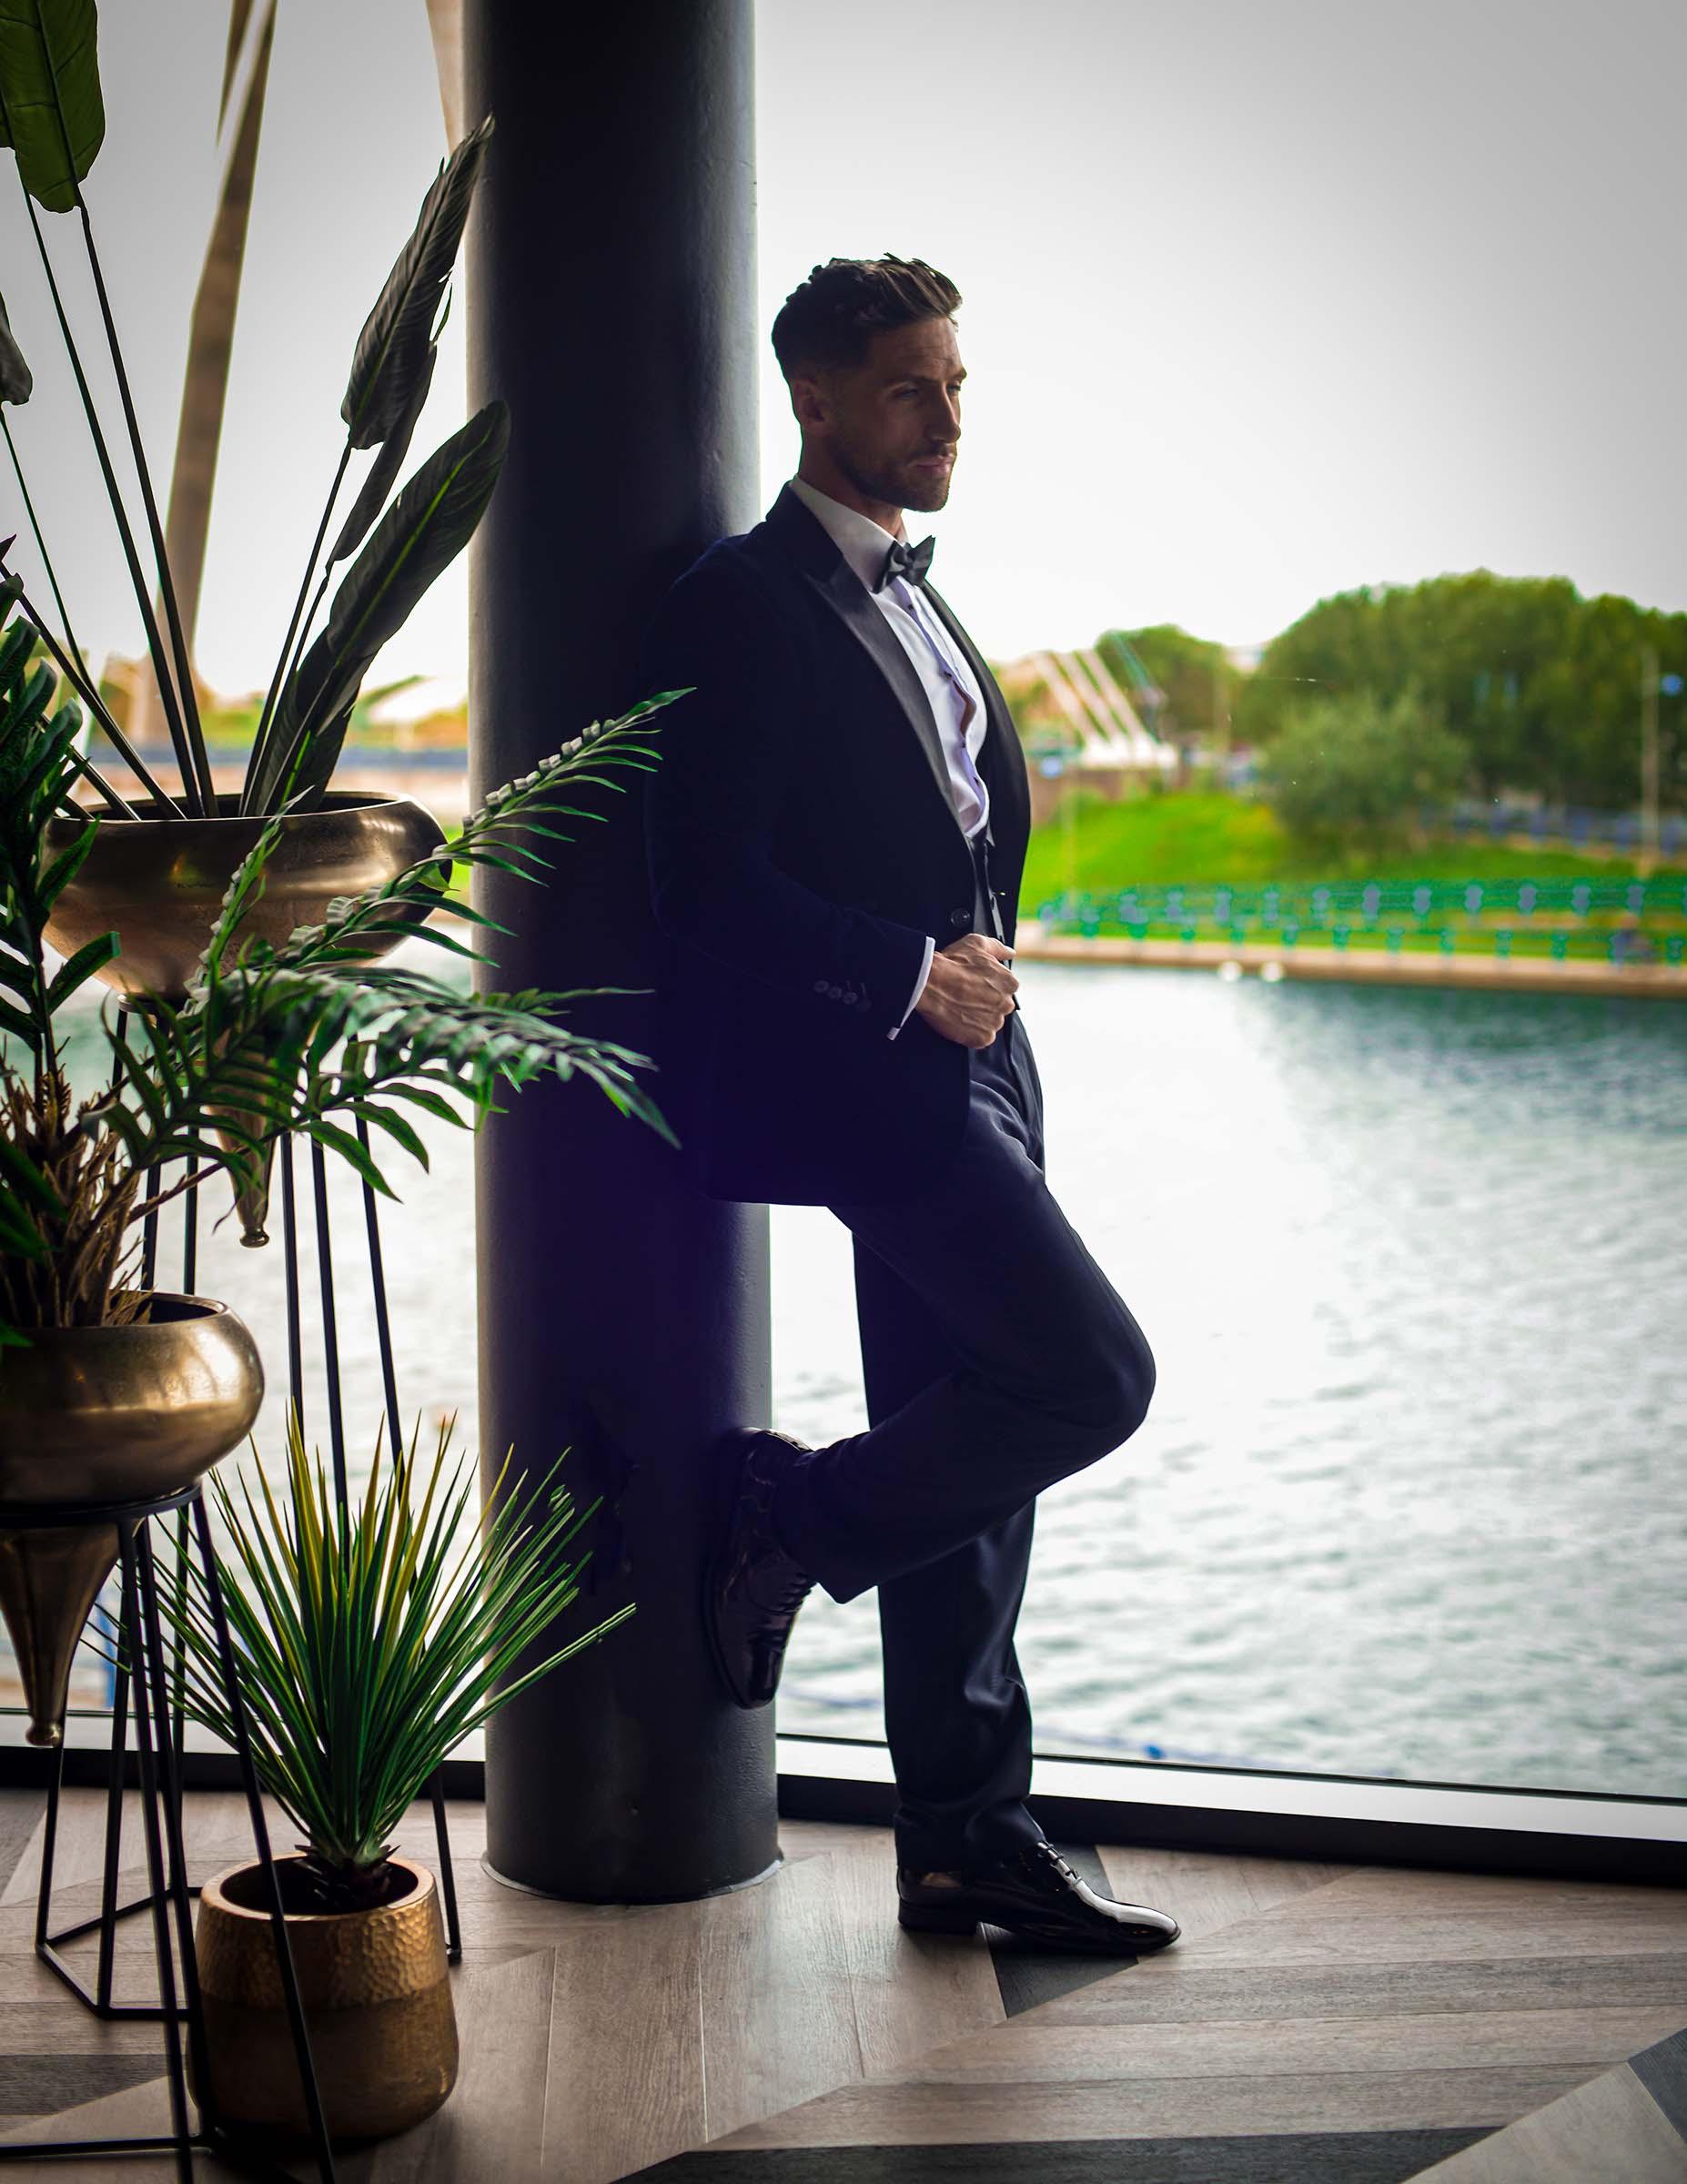 alternative luxe wedding - slytherin wedding - gothic wedding - alternative wedding - purple wedding suit - alternative groomswear